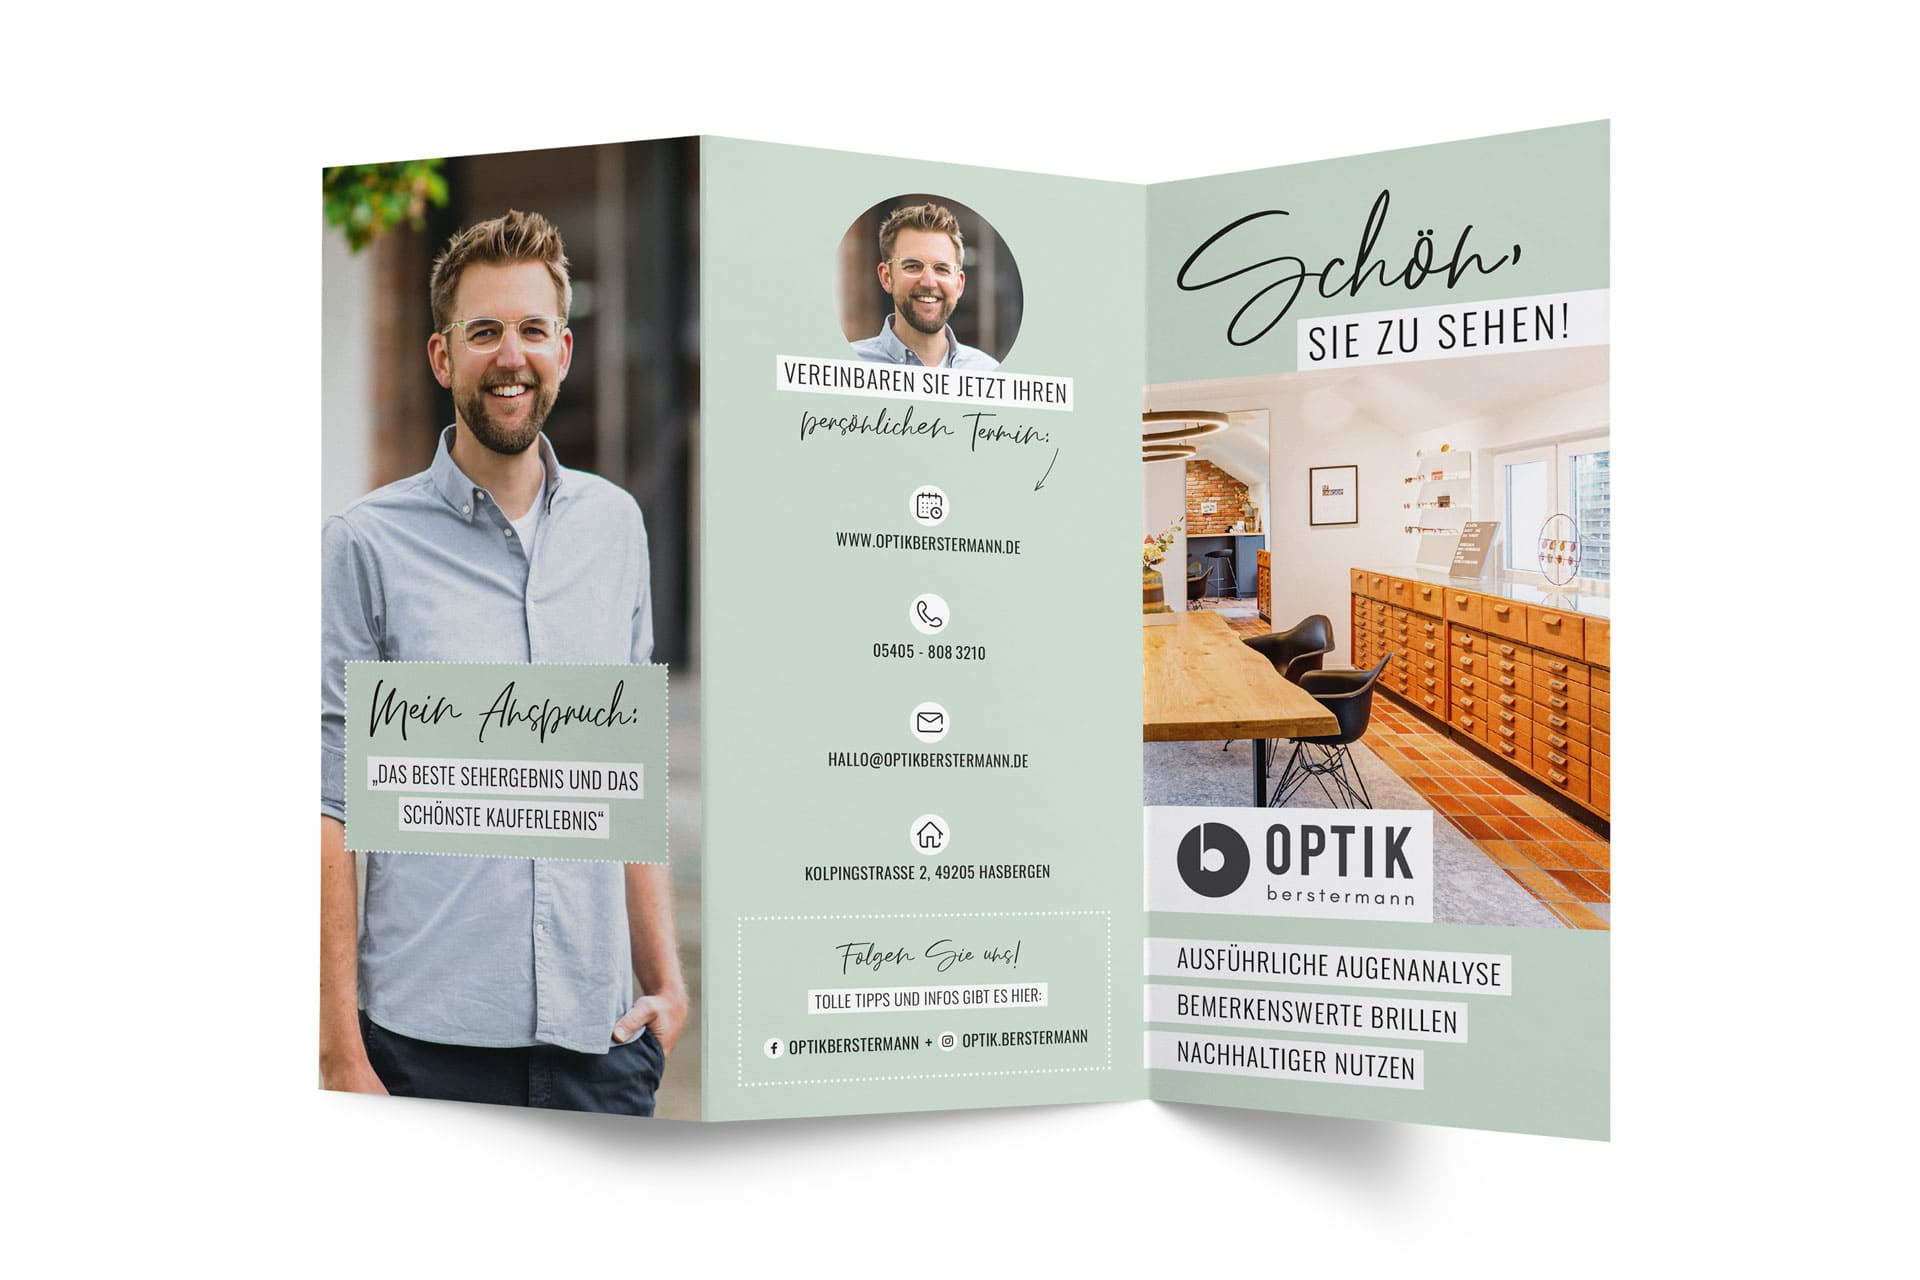 Flyer-Design Optik Berstermann